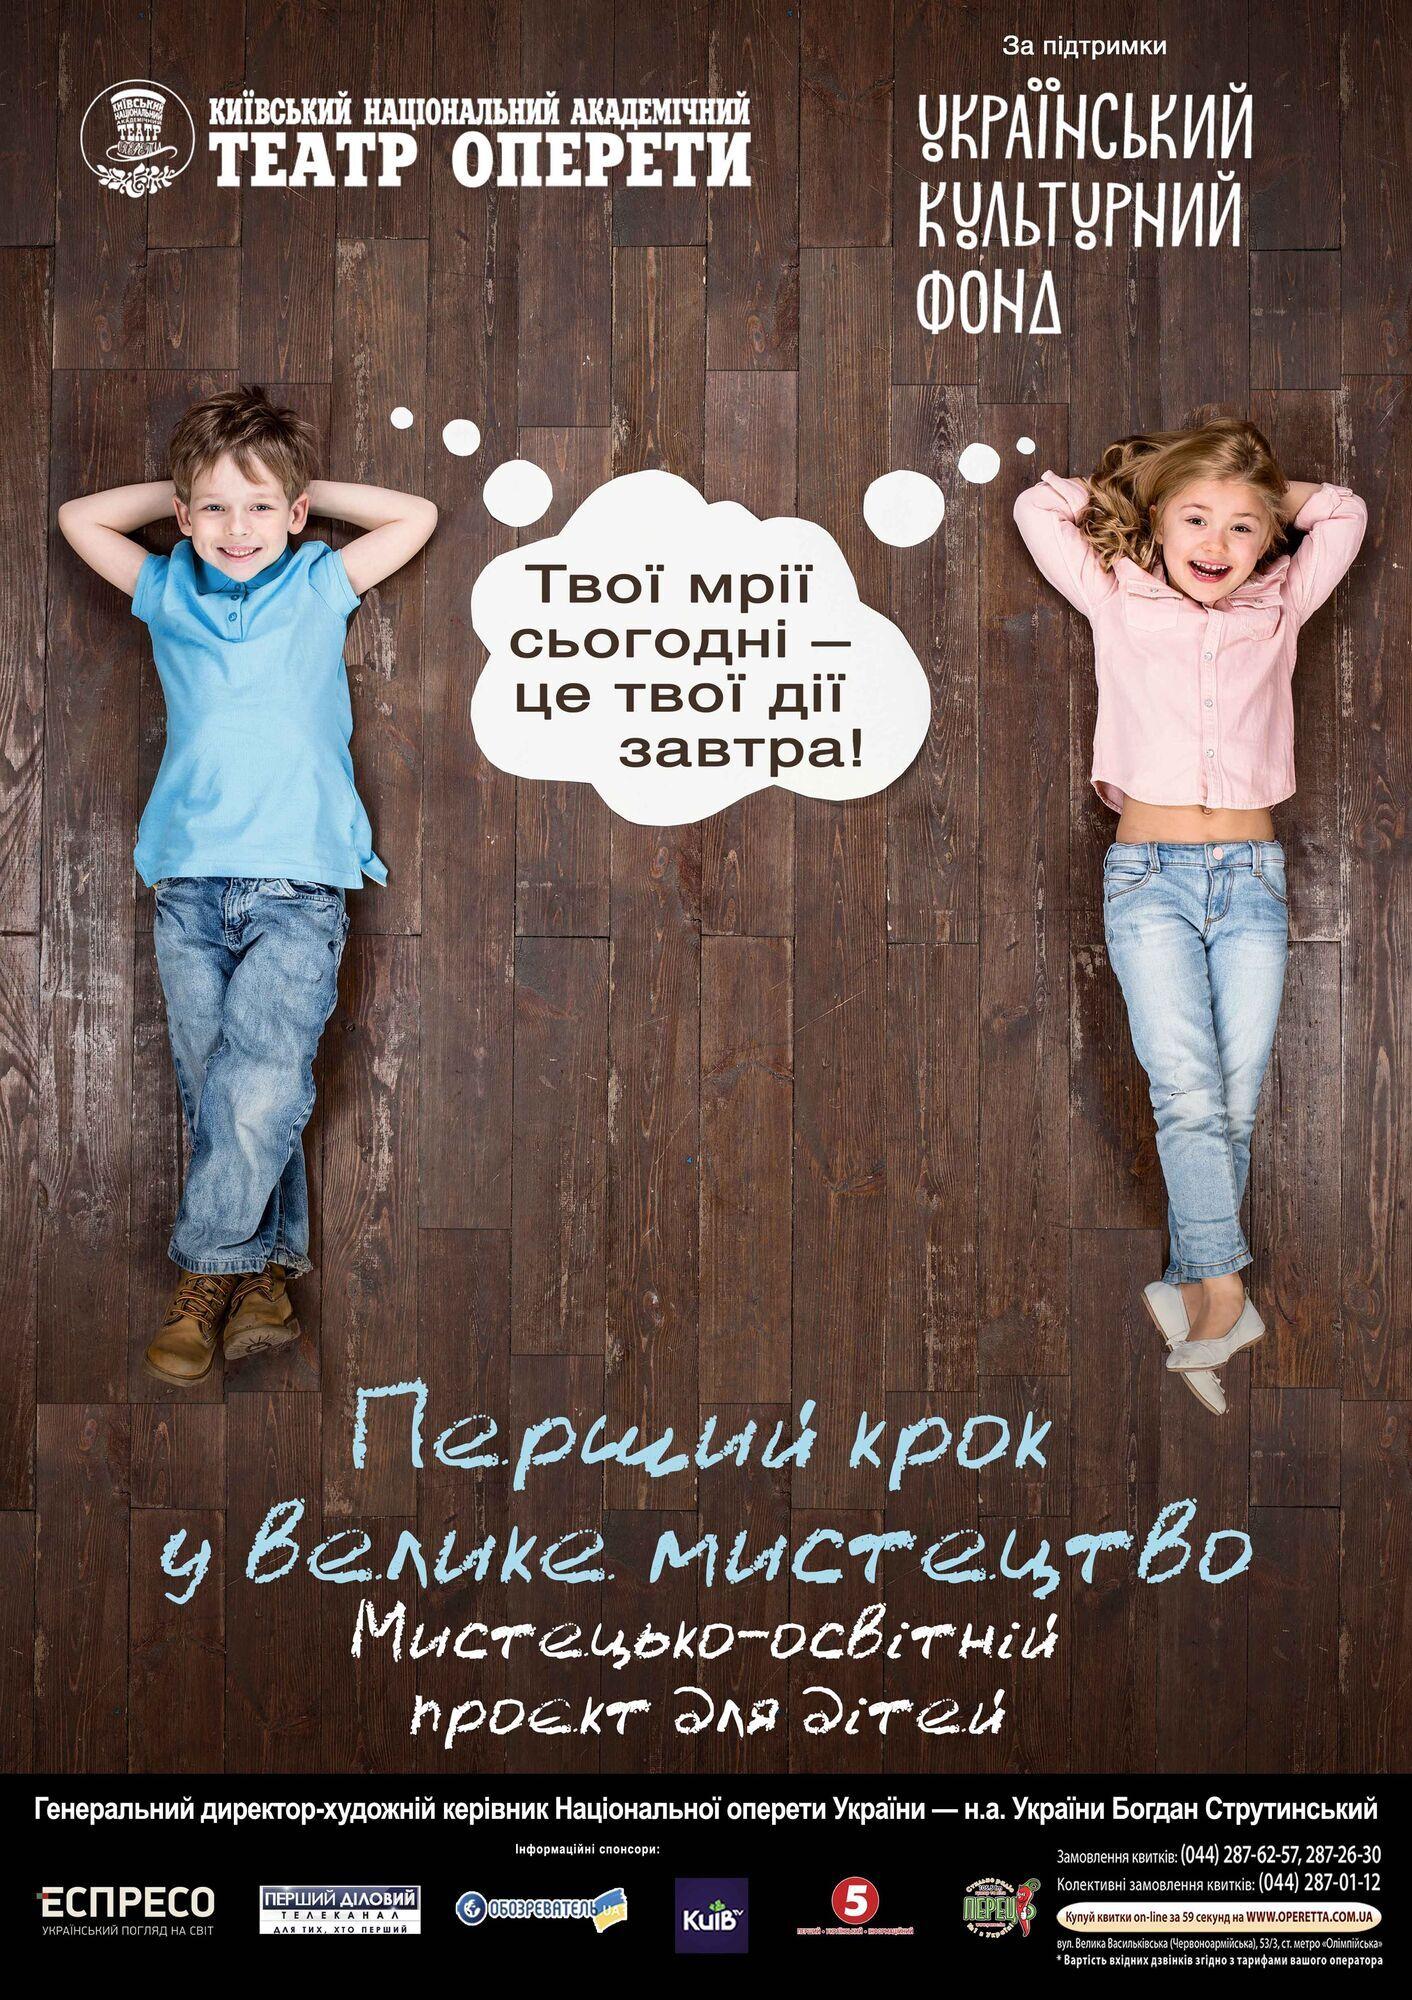 Национальная оперетта Украины.